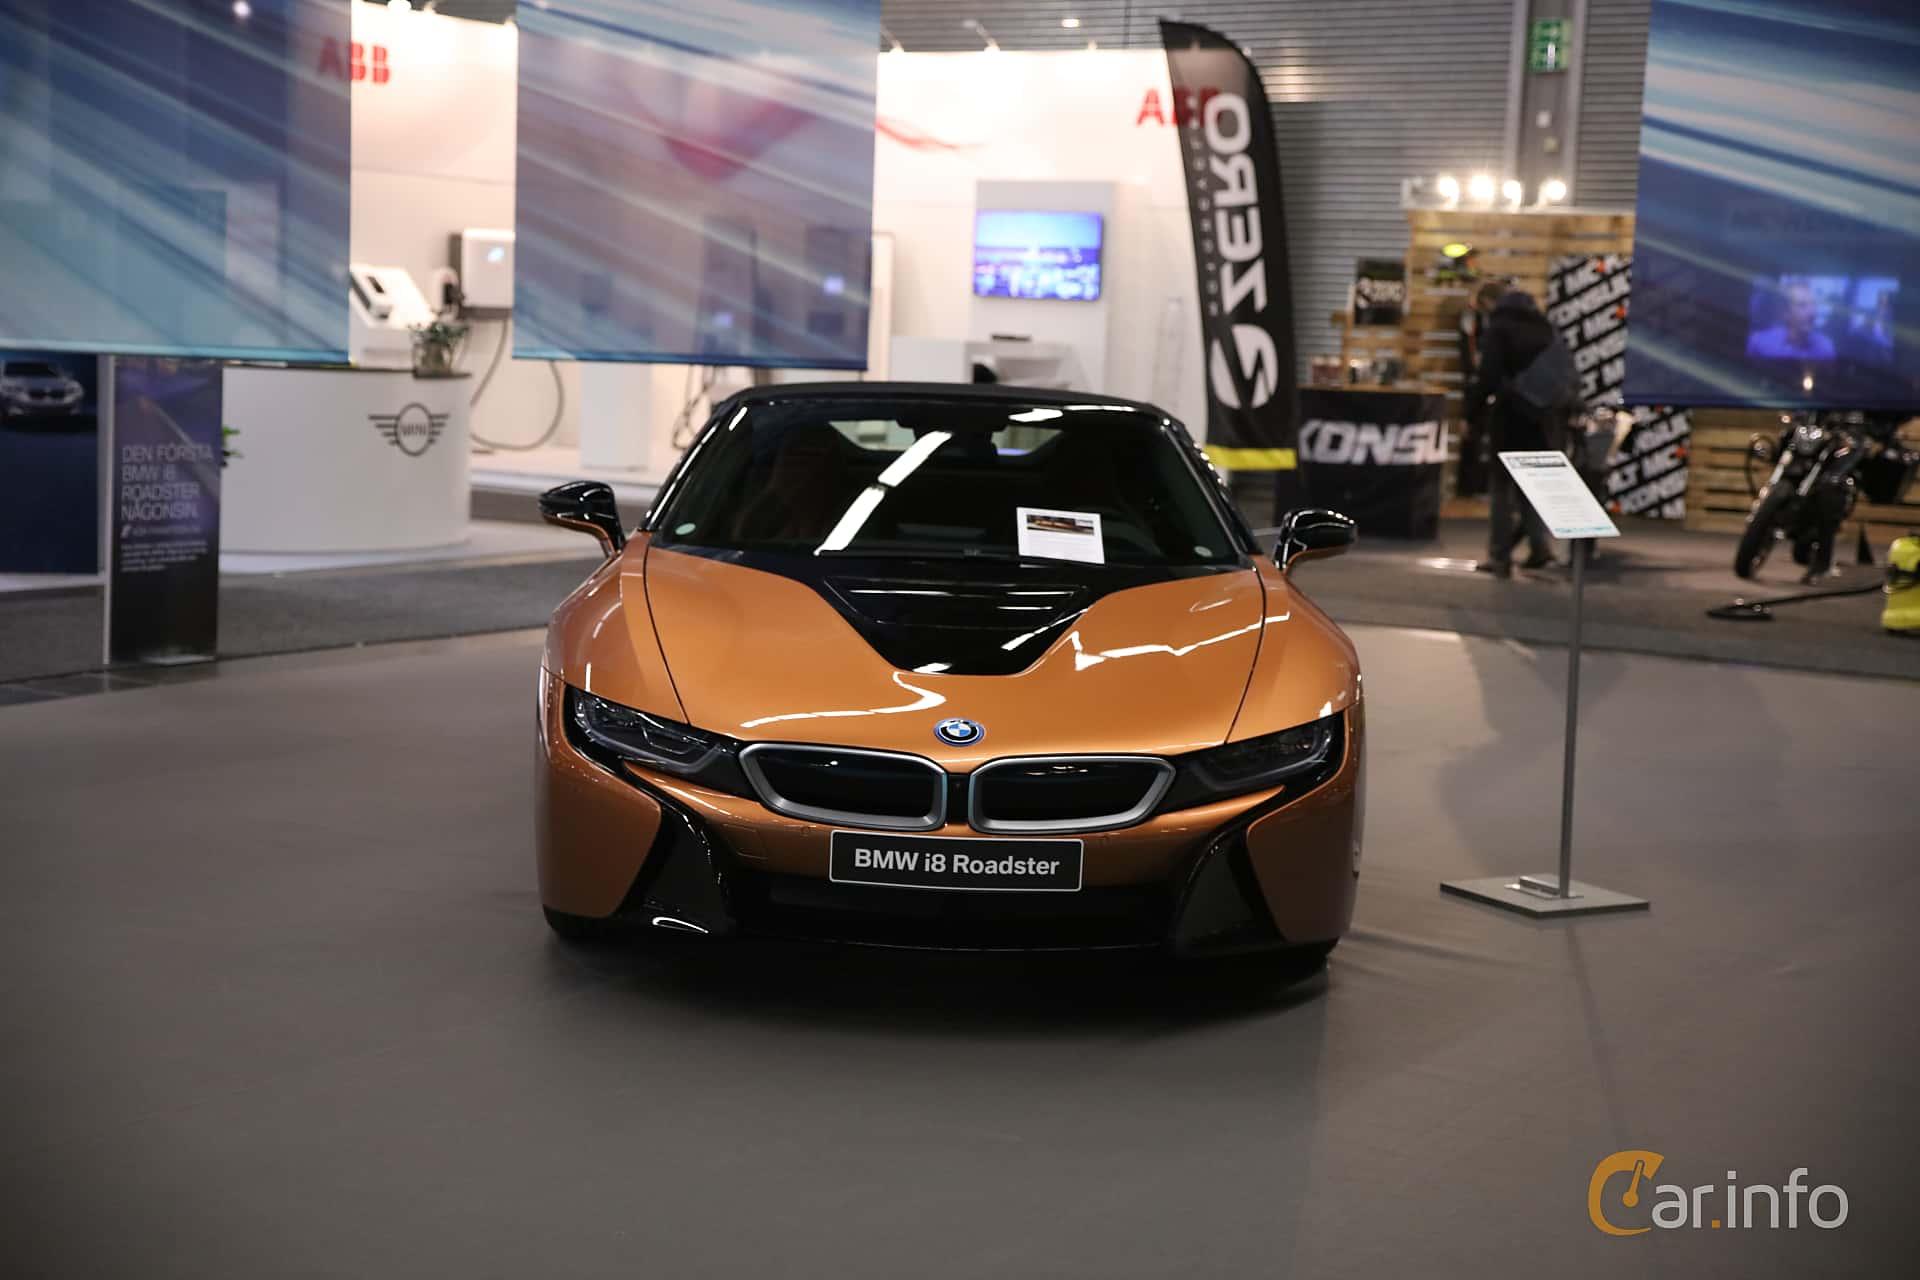 BMW i8 Roadster 1.5 + 11.6 kWh Steptronic, 374hp, 2019 at eCar Expo Göteborg 2018